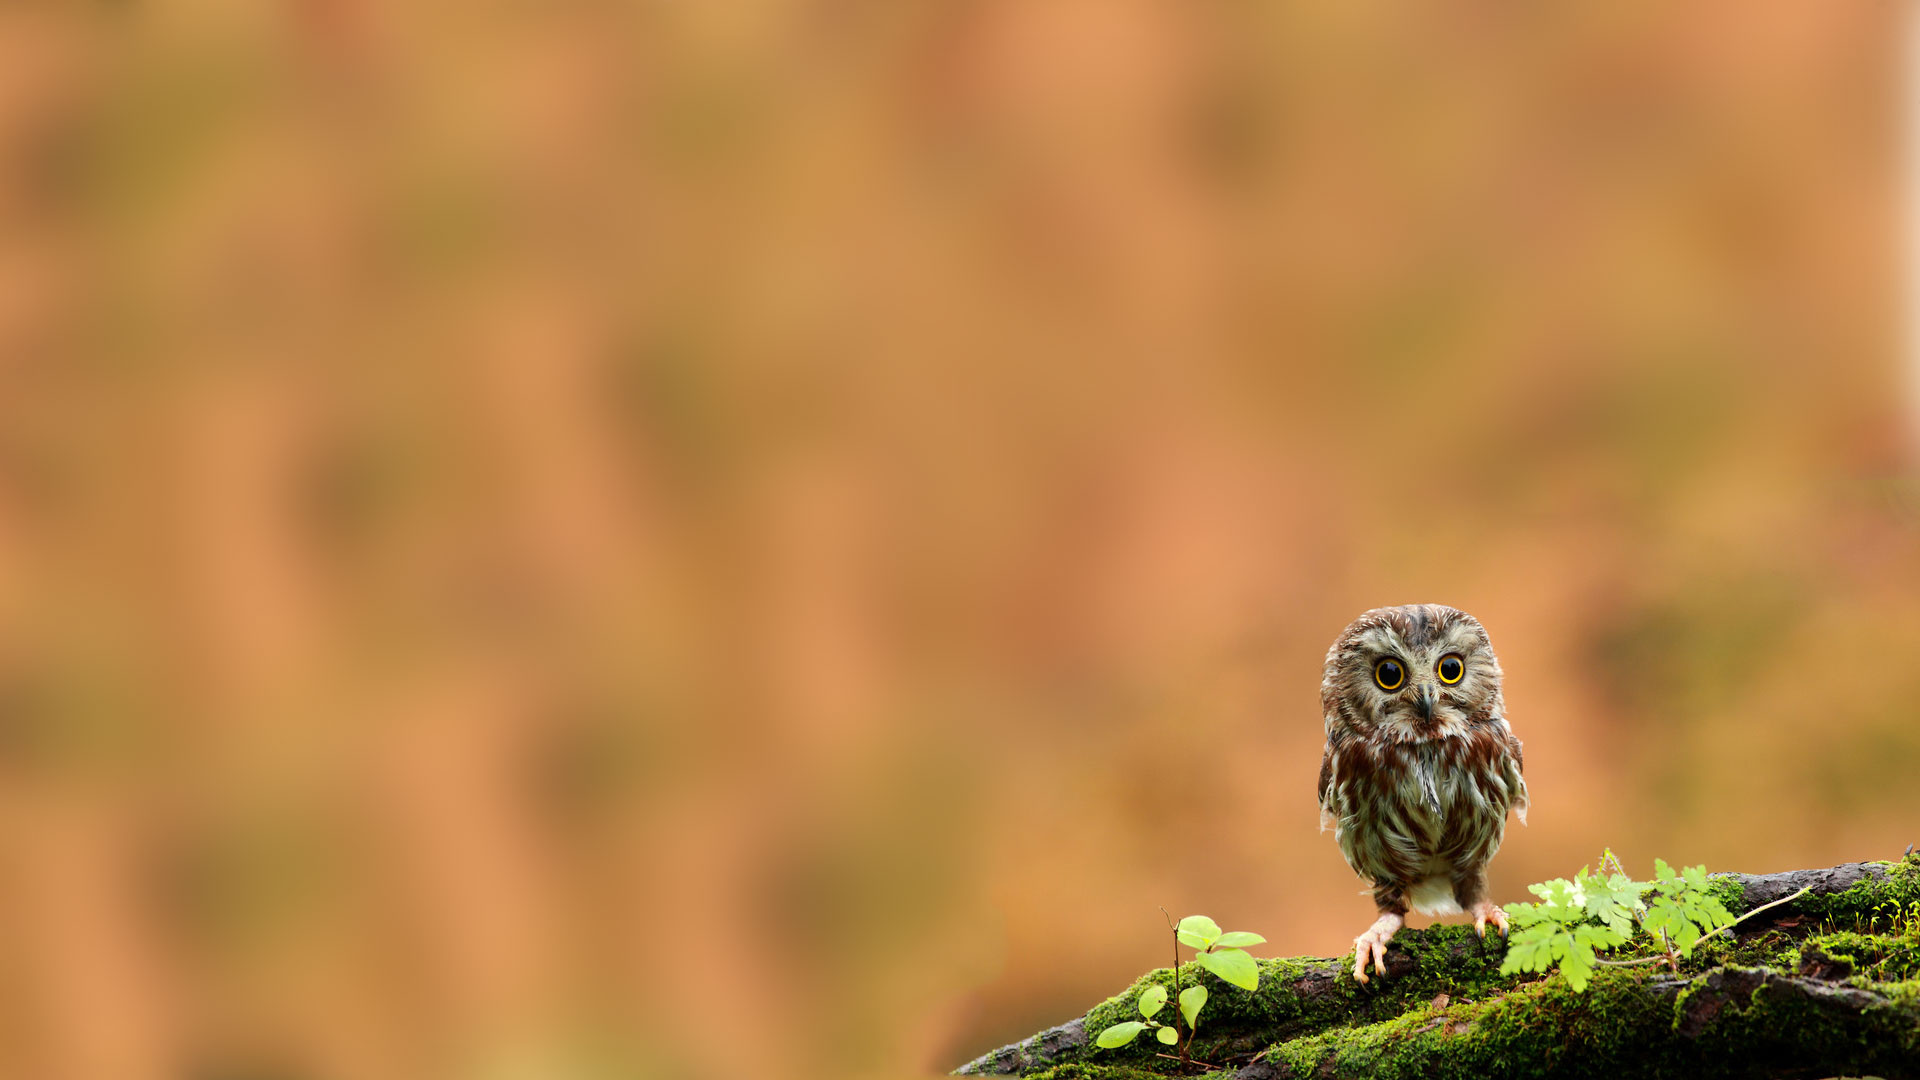 Cute-Owlet-full... Owl Desktop Wallpaper Hd